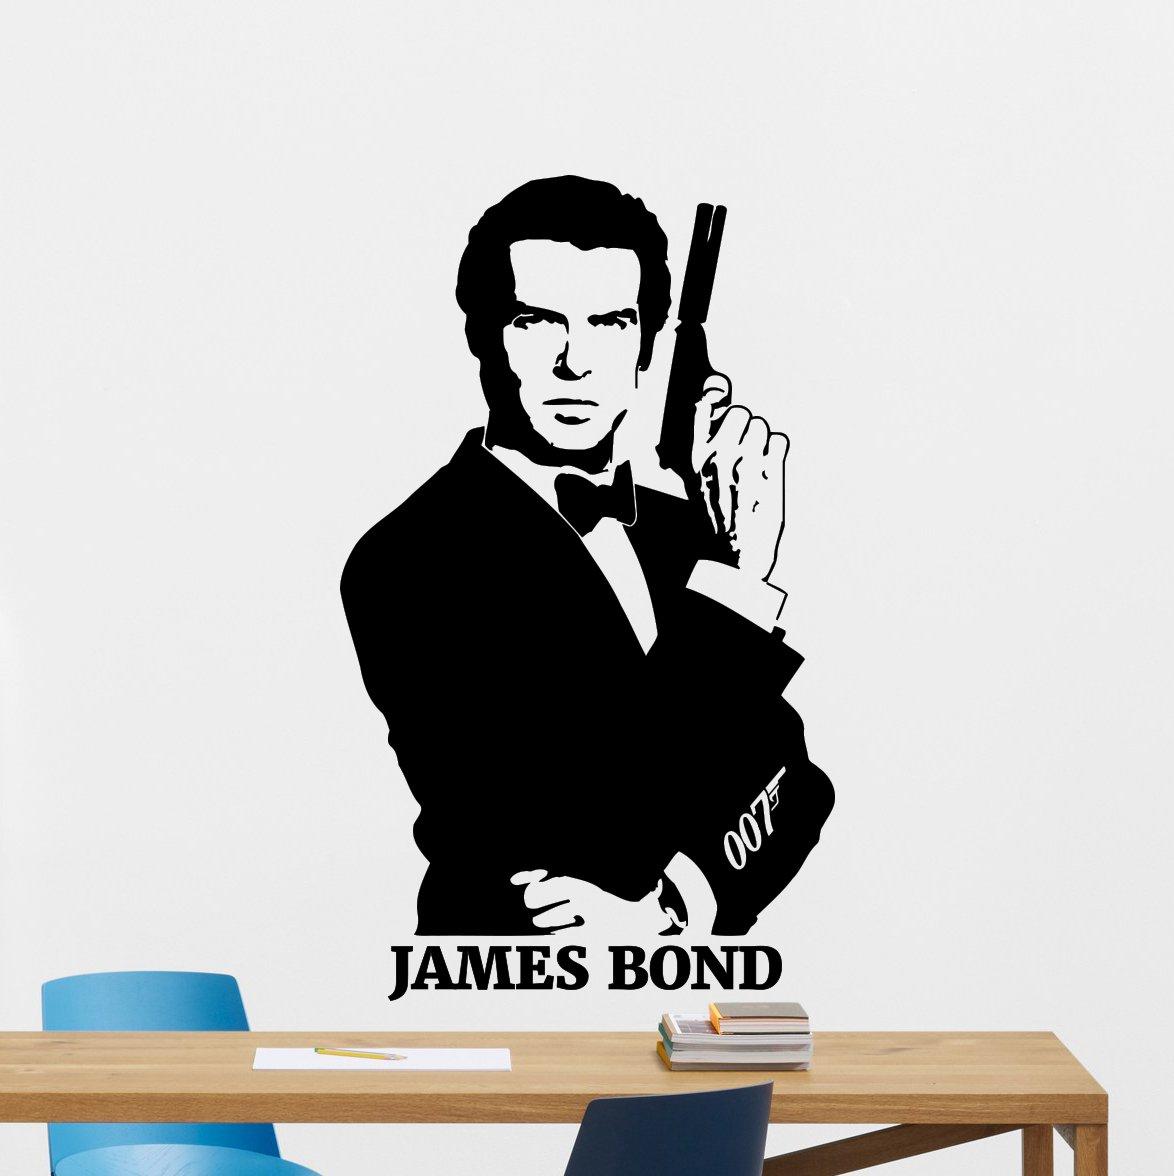 James Bond Wall Decal Pierce Brosnan Agent 007 Vinyl Sticker Spy Movie Wall Art Design Housewares Kids Room Bedroom Decor Removable Wall Mural 67zzz